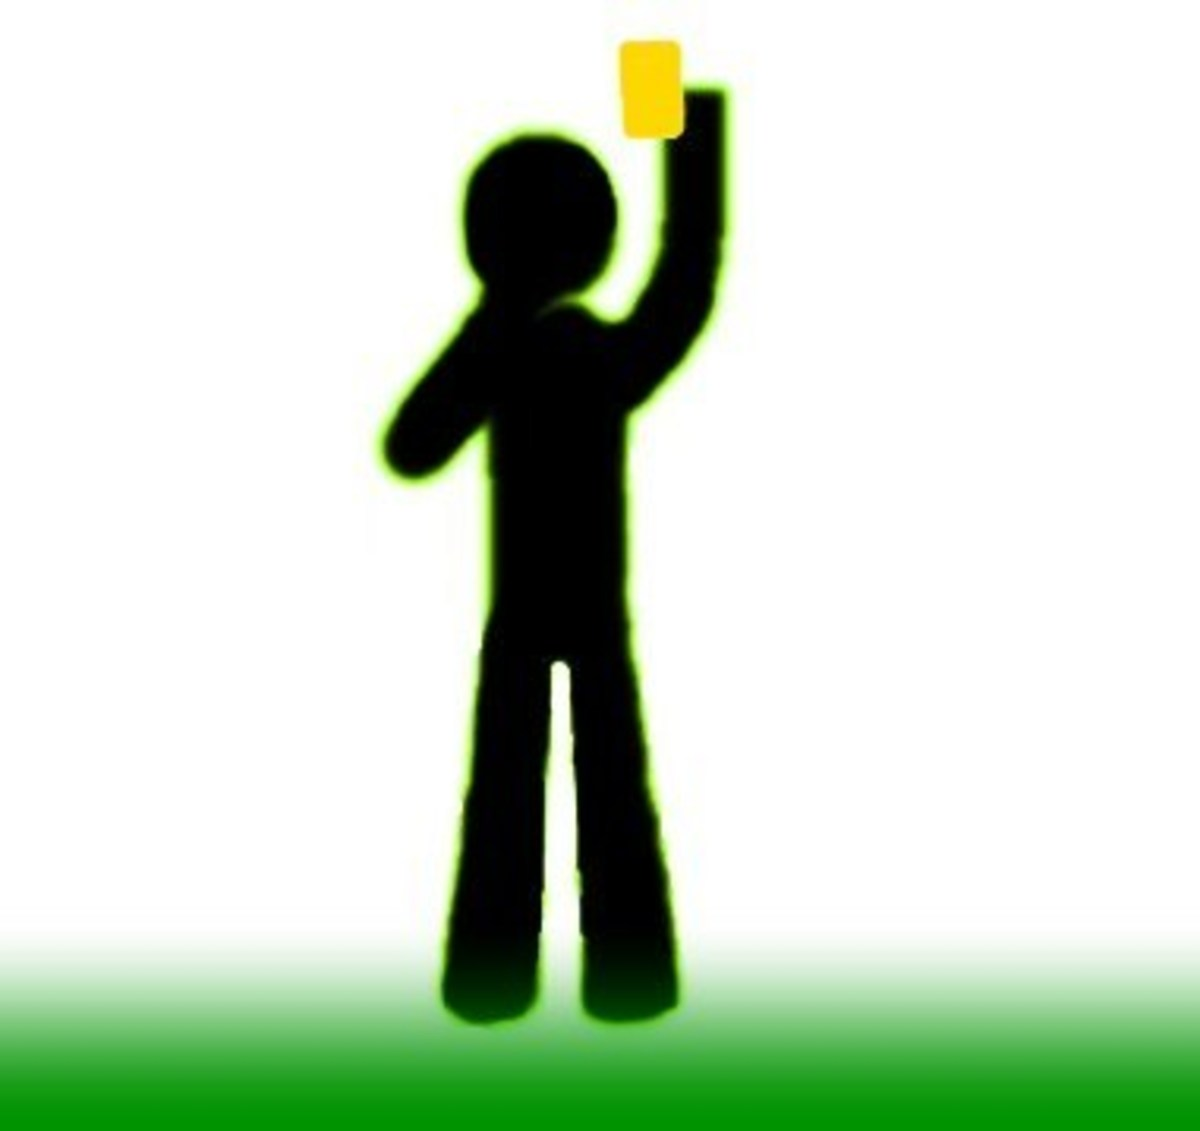 Showing Yellow Card–Warning